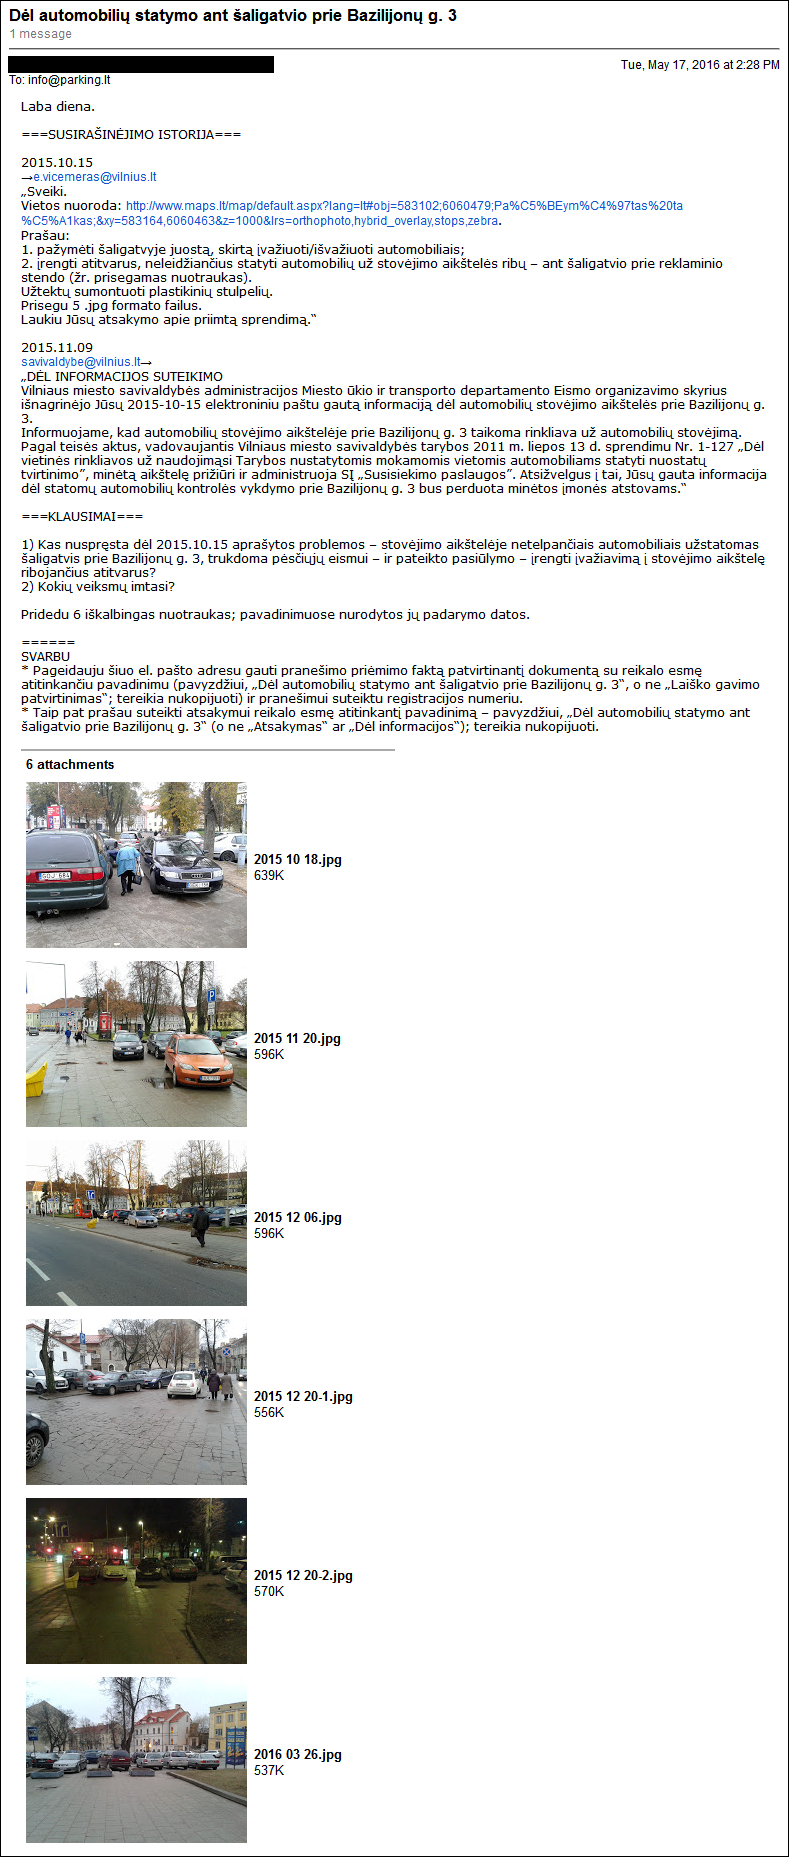 20160304-automobiliu-stovejimo-aikstele-bazilijonu-3-16.jpg